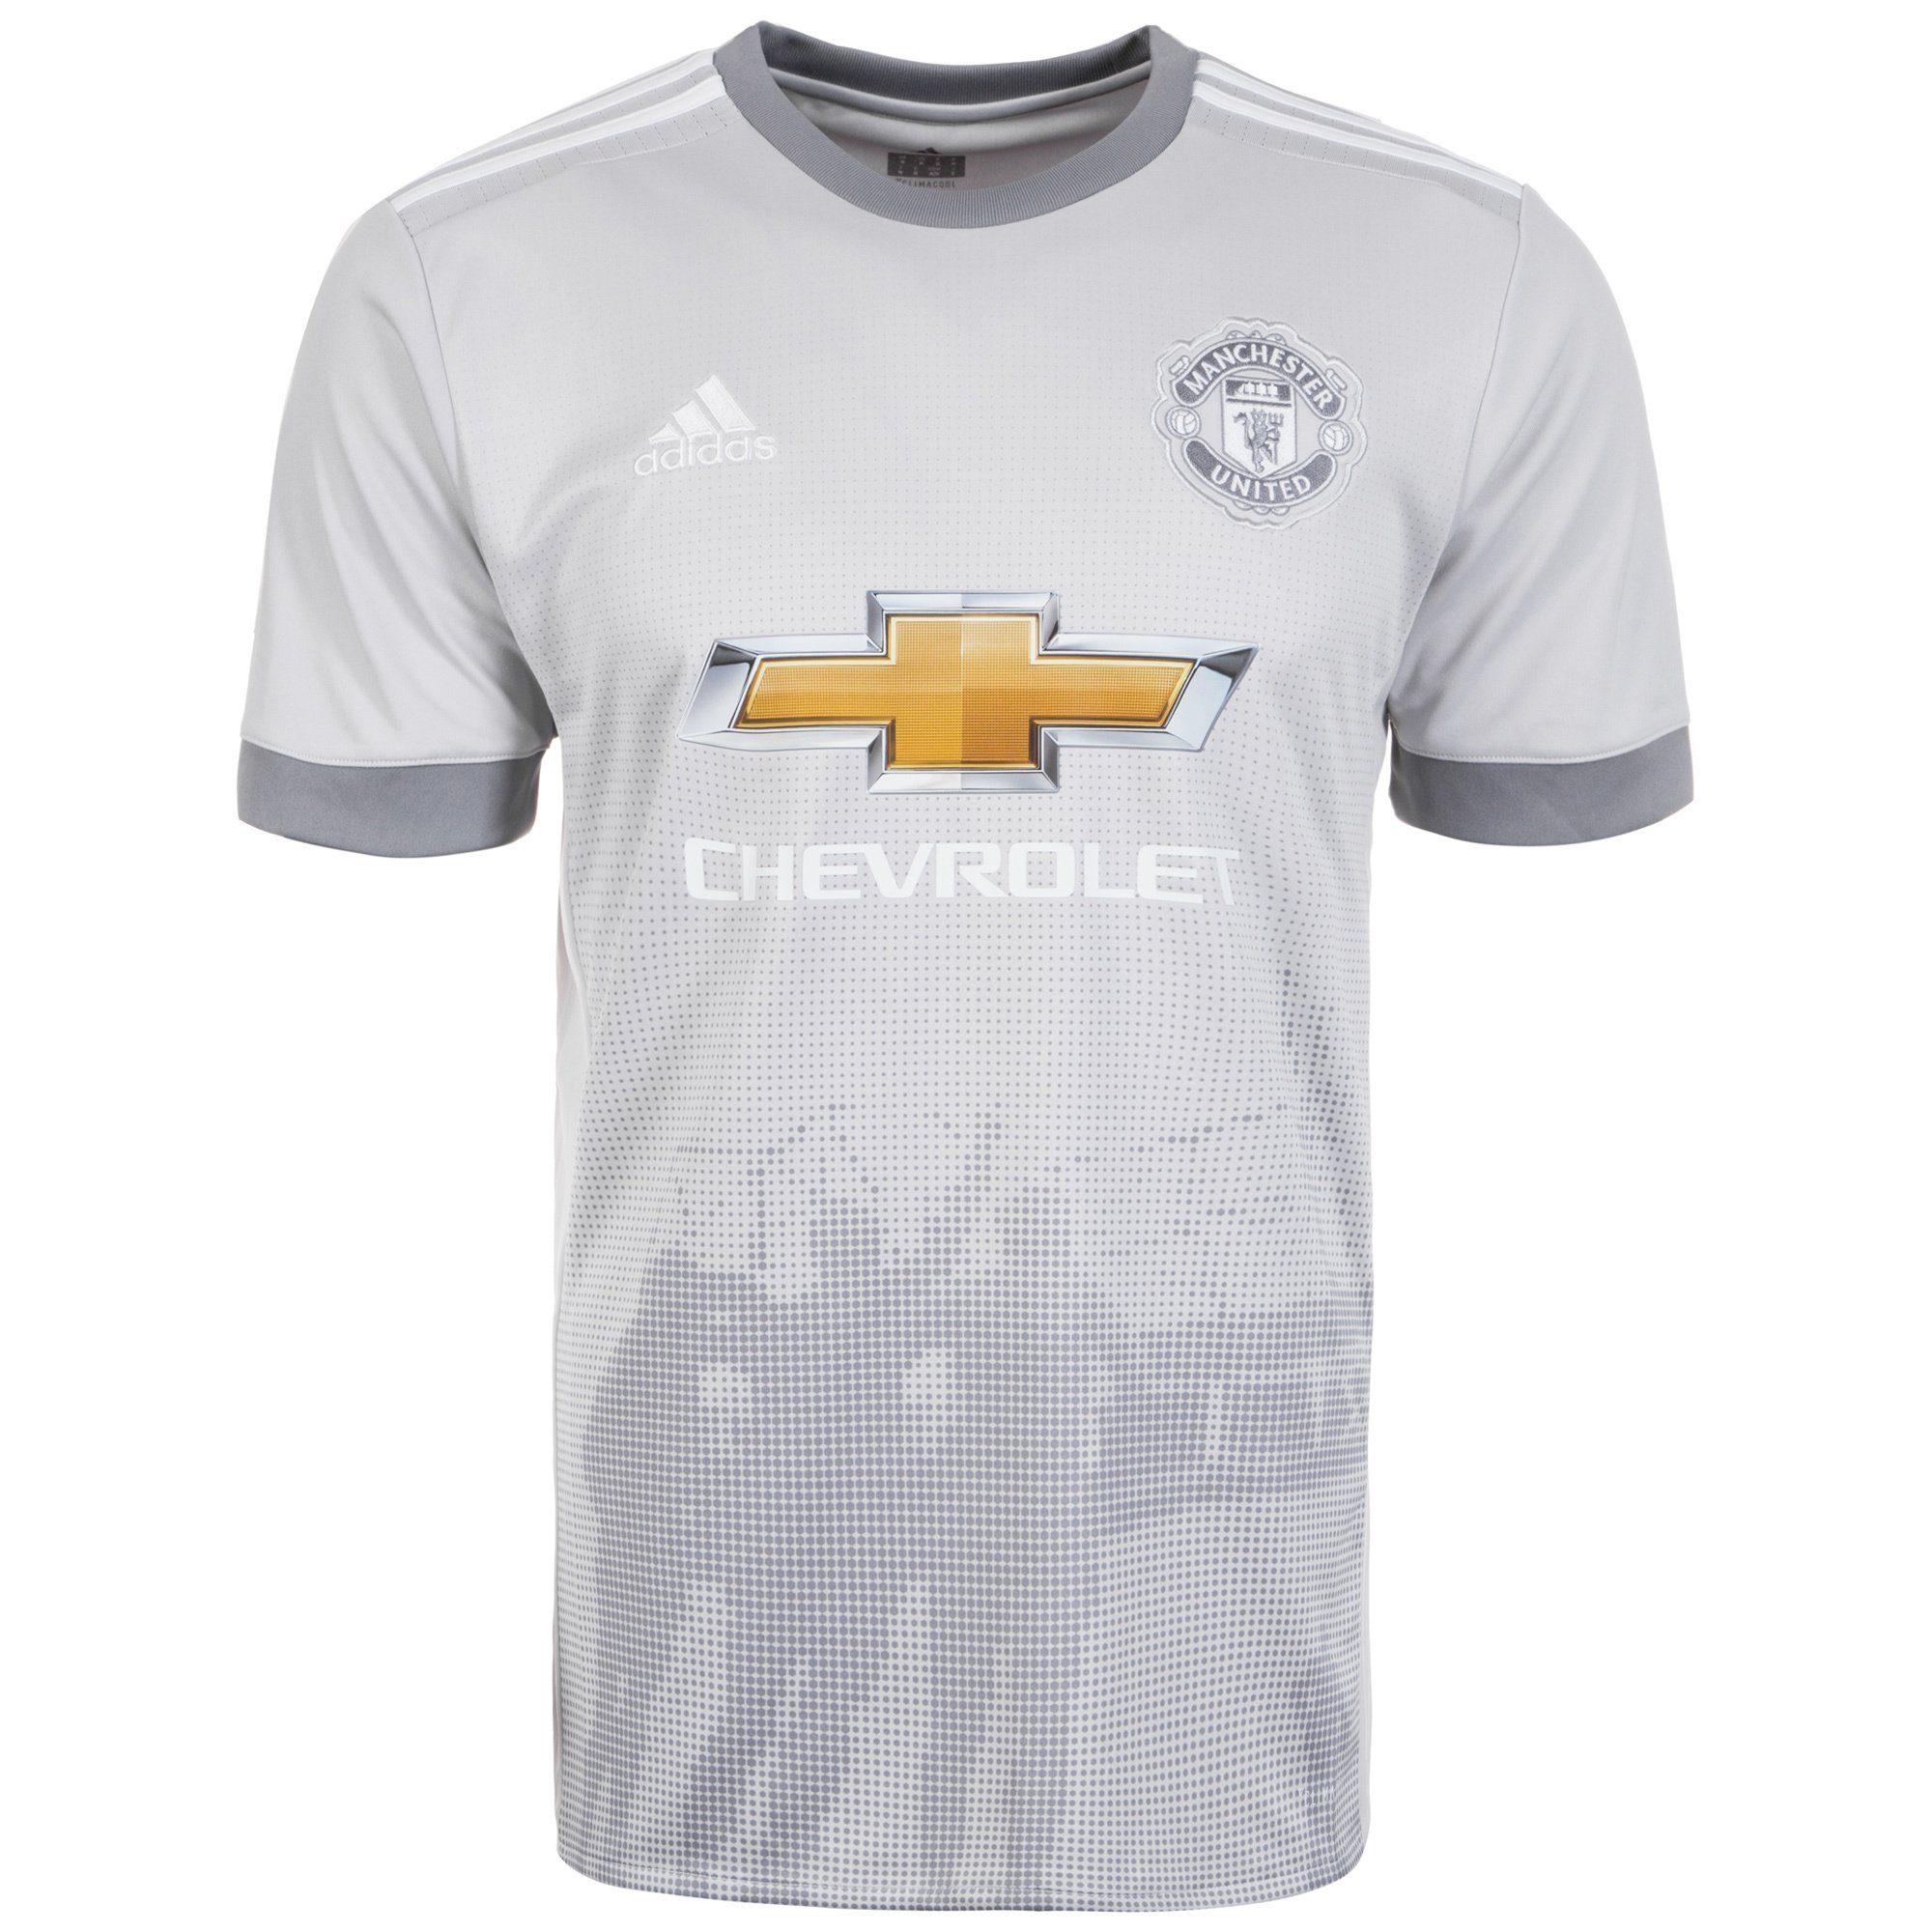 adidas Performance Fußballtrikot Manchester United 17/18 3rd | Sportbekleidung > Trikots > Fußballtrikots | Grau | Trikot | Adidas Performance